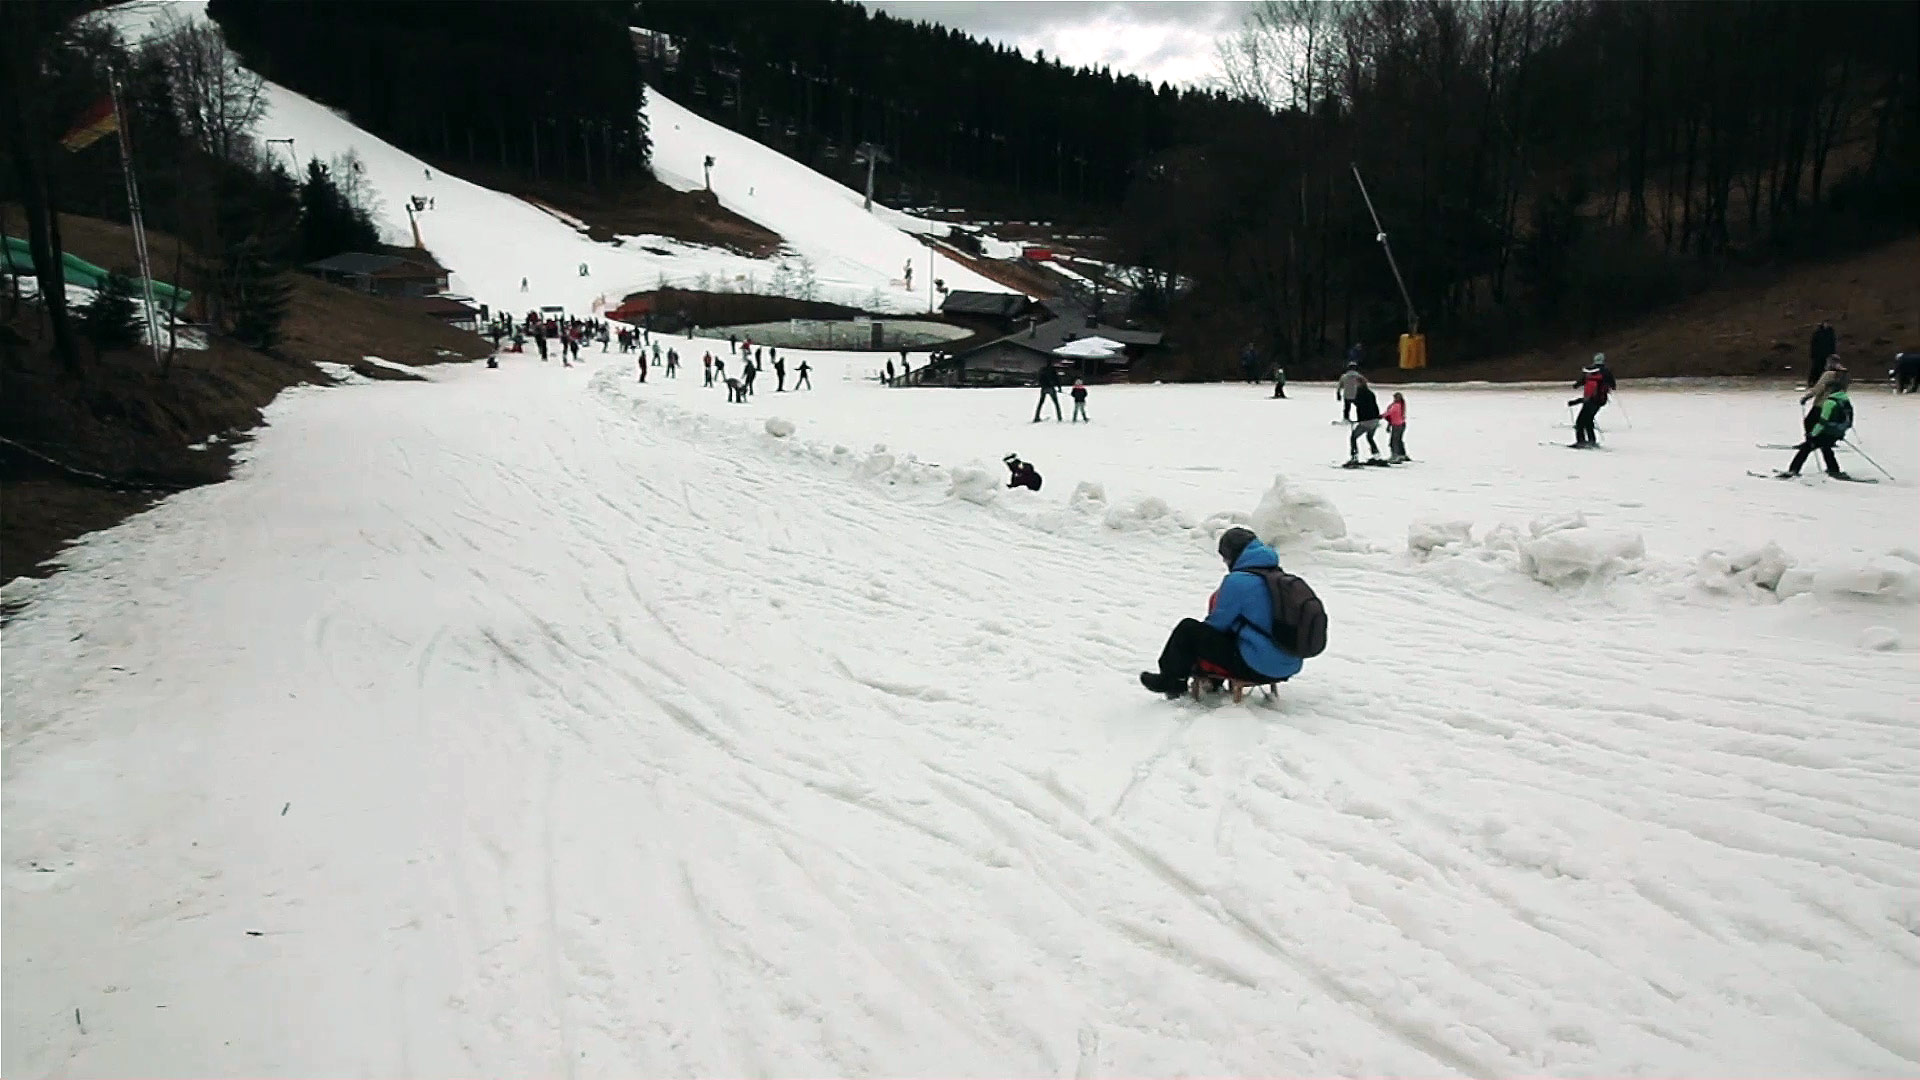 schnee in winterberg skigebiet winterberg skiurlaub winterberg winterurlaub winterberg schnee. Black Bedroom Furniture Sets. Home Design Ideas